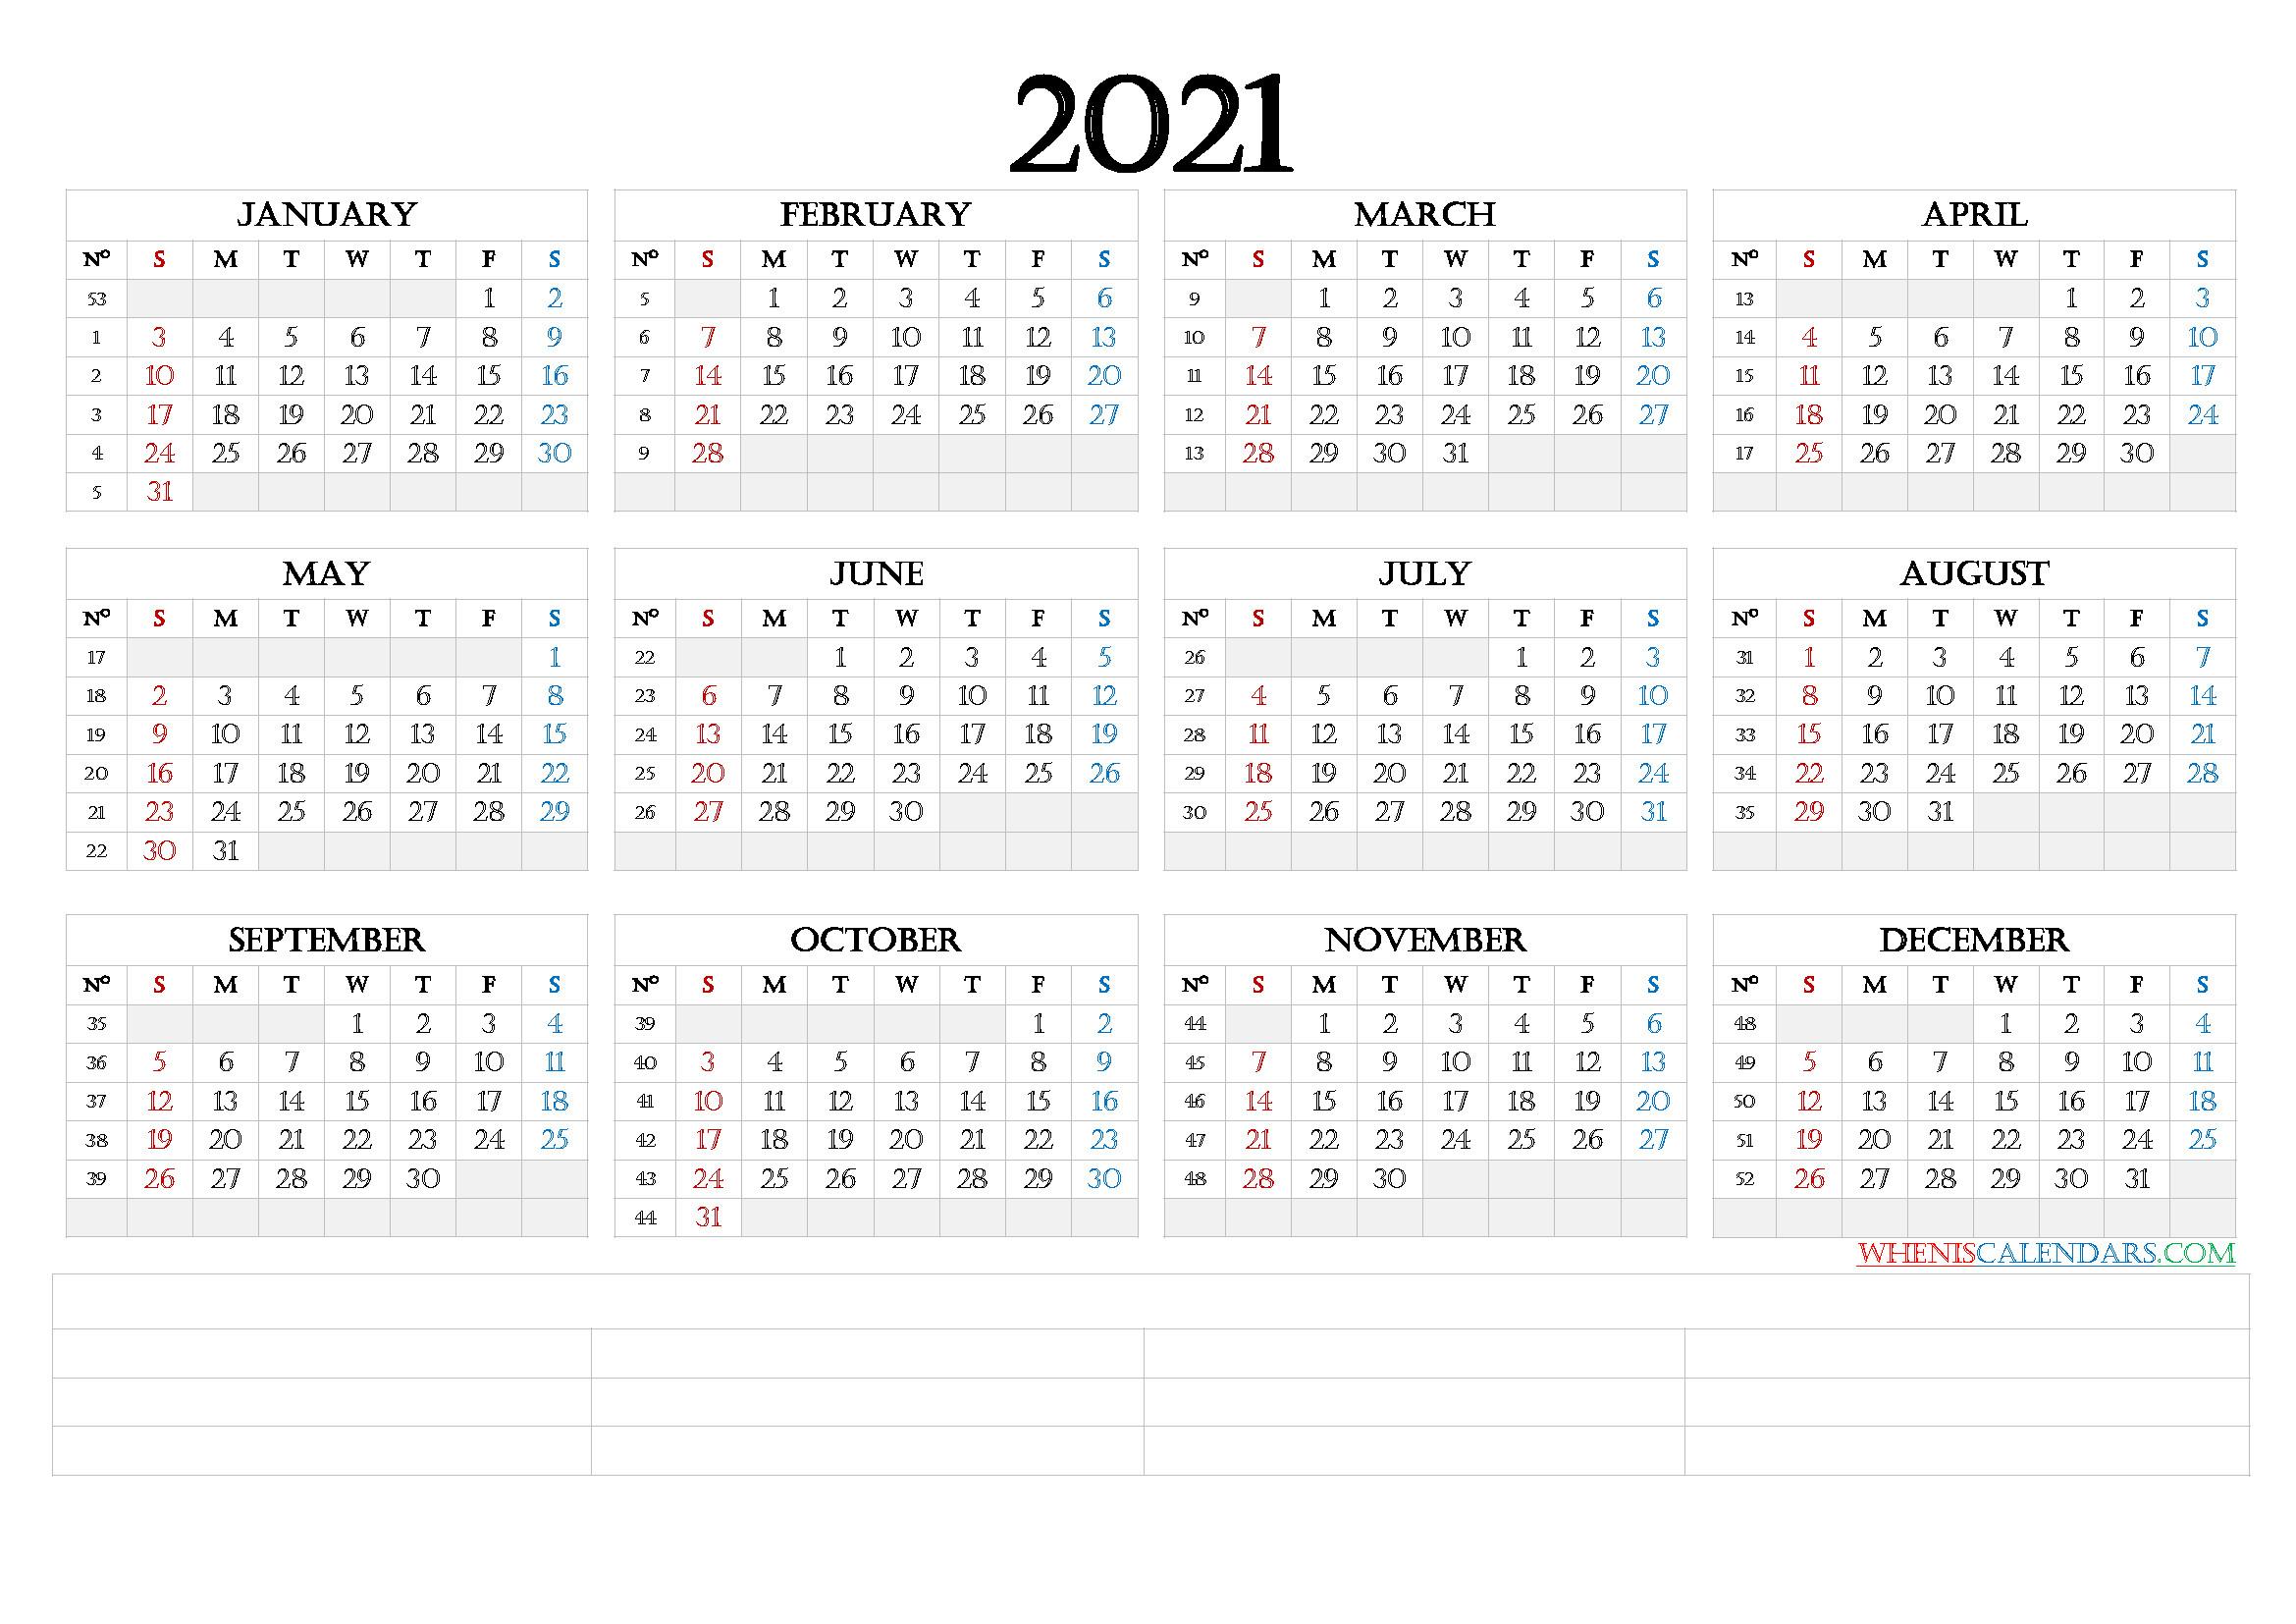 12 Month Calendar Printable 2021 (6 Templates) - Free 2020  2021 12 Month Calendar Printable Free Pdf